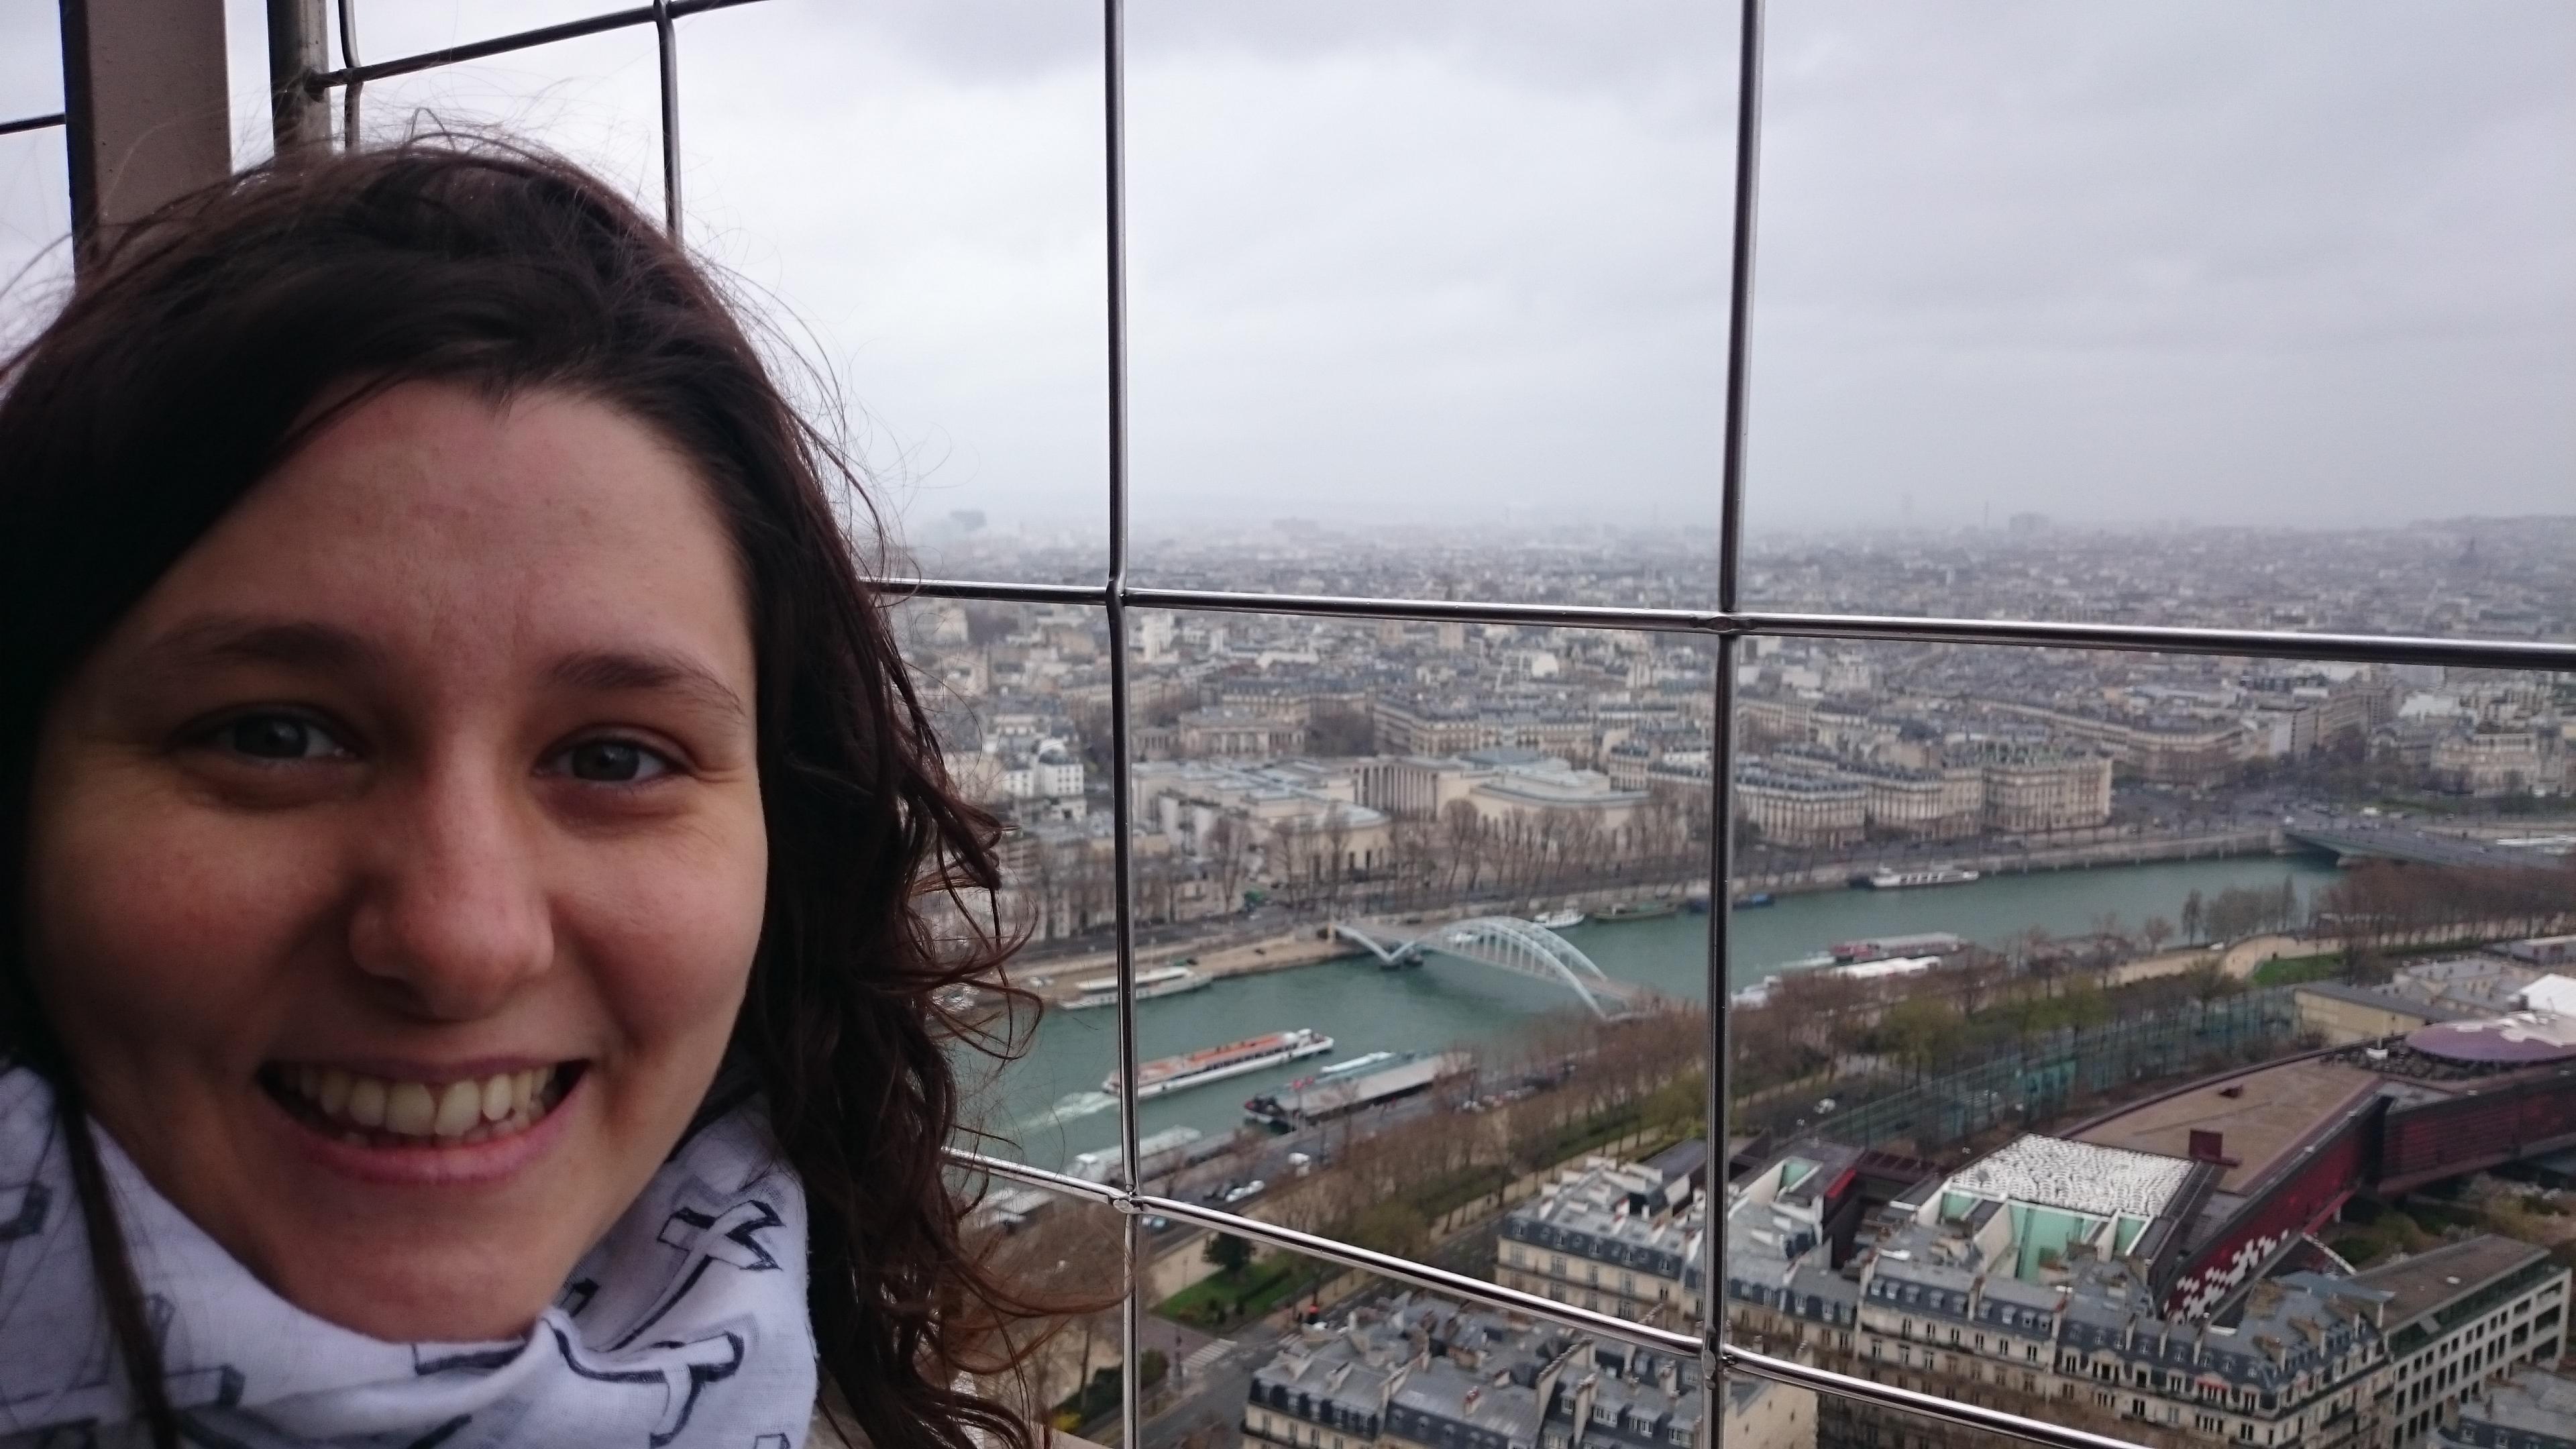 DSC 1919 - Visitando la Torre Eiffel en Paris